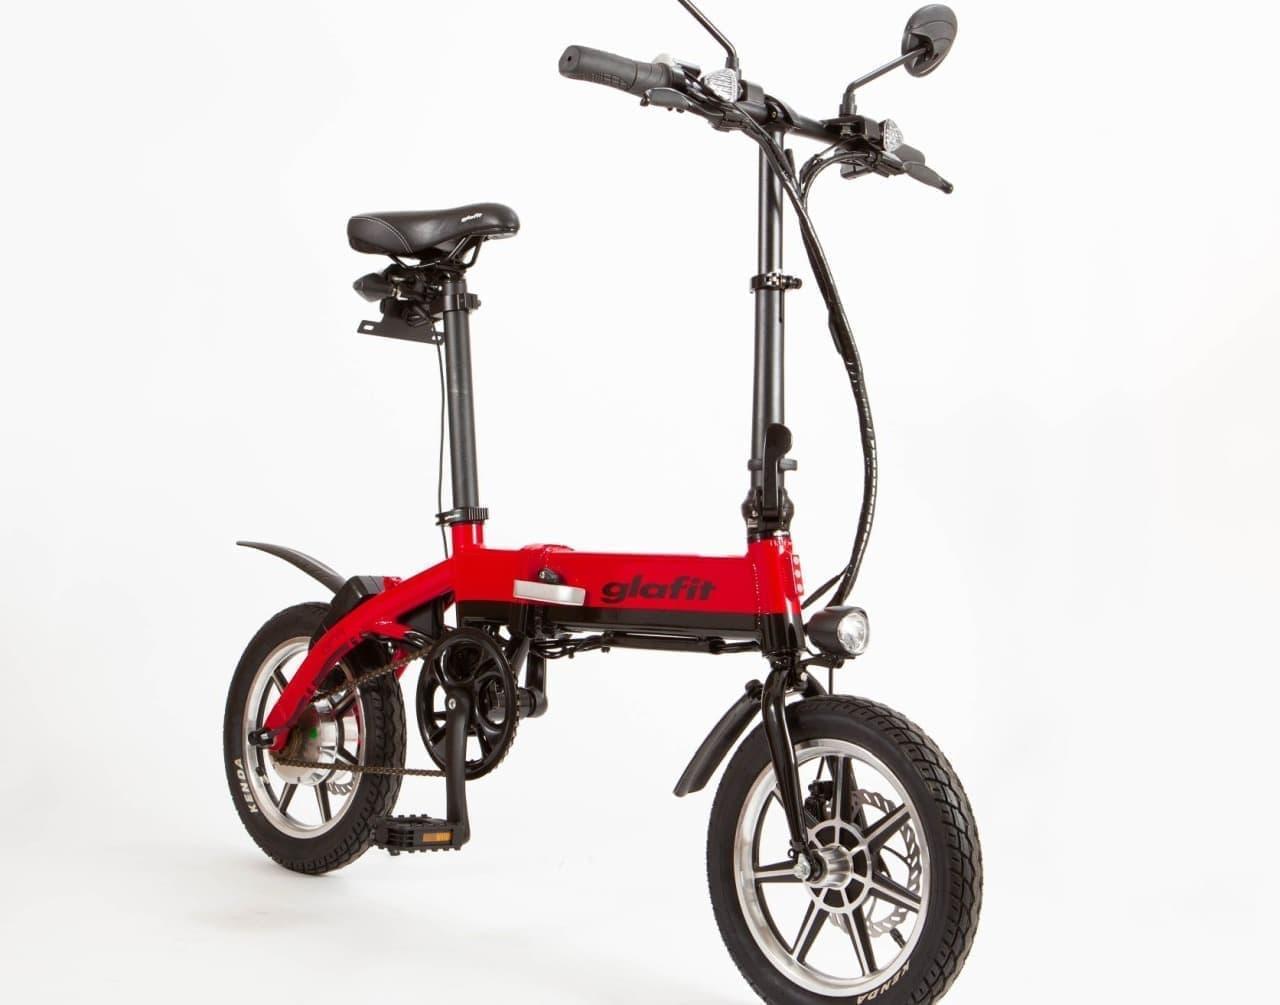 「glafitバイクのレンタル試乗」、6月18日スタート